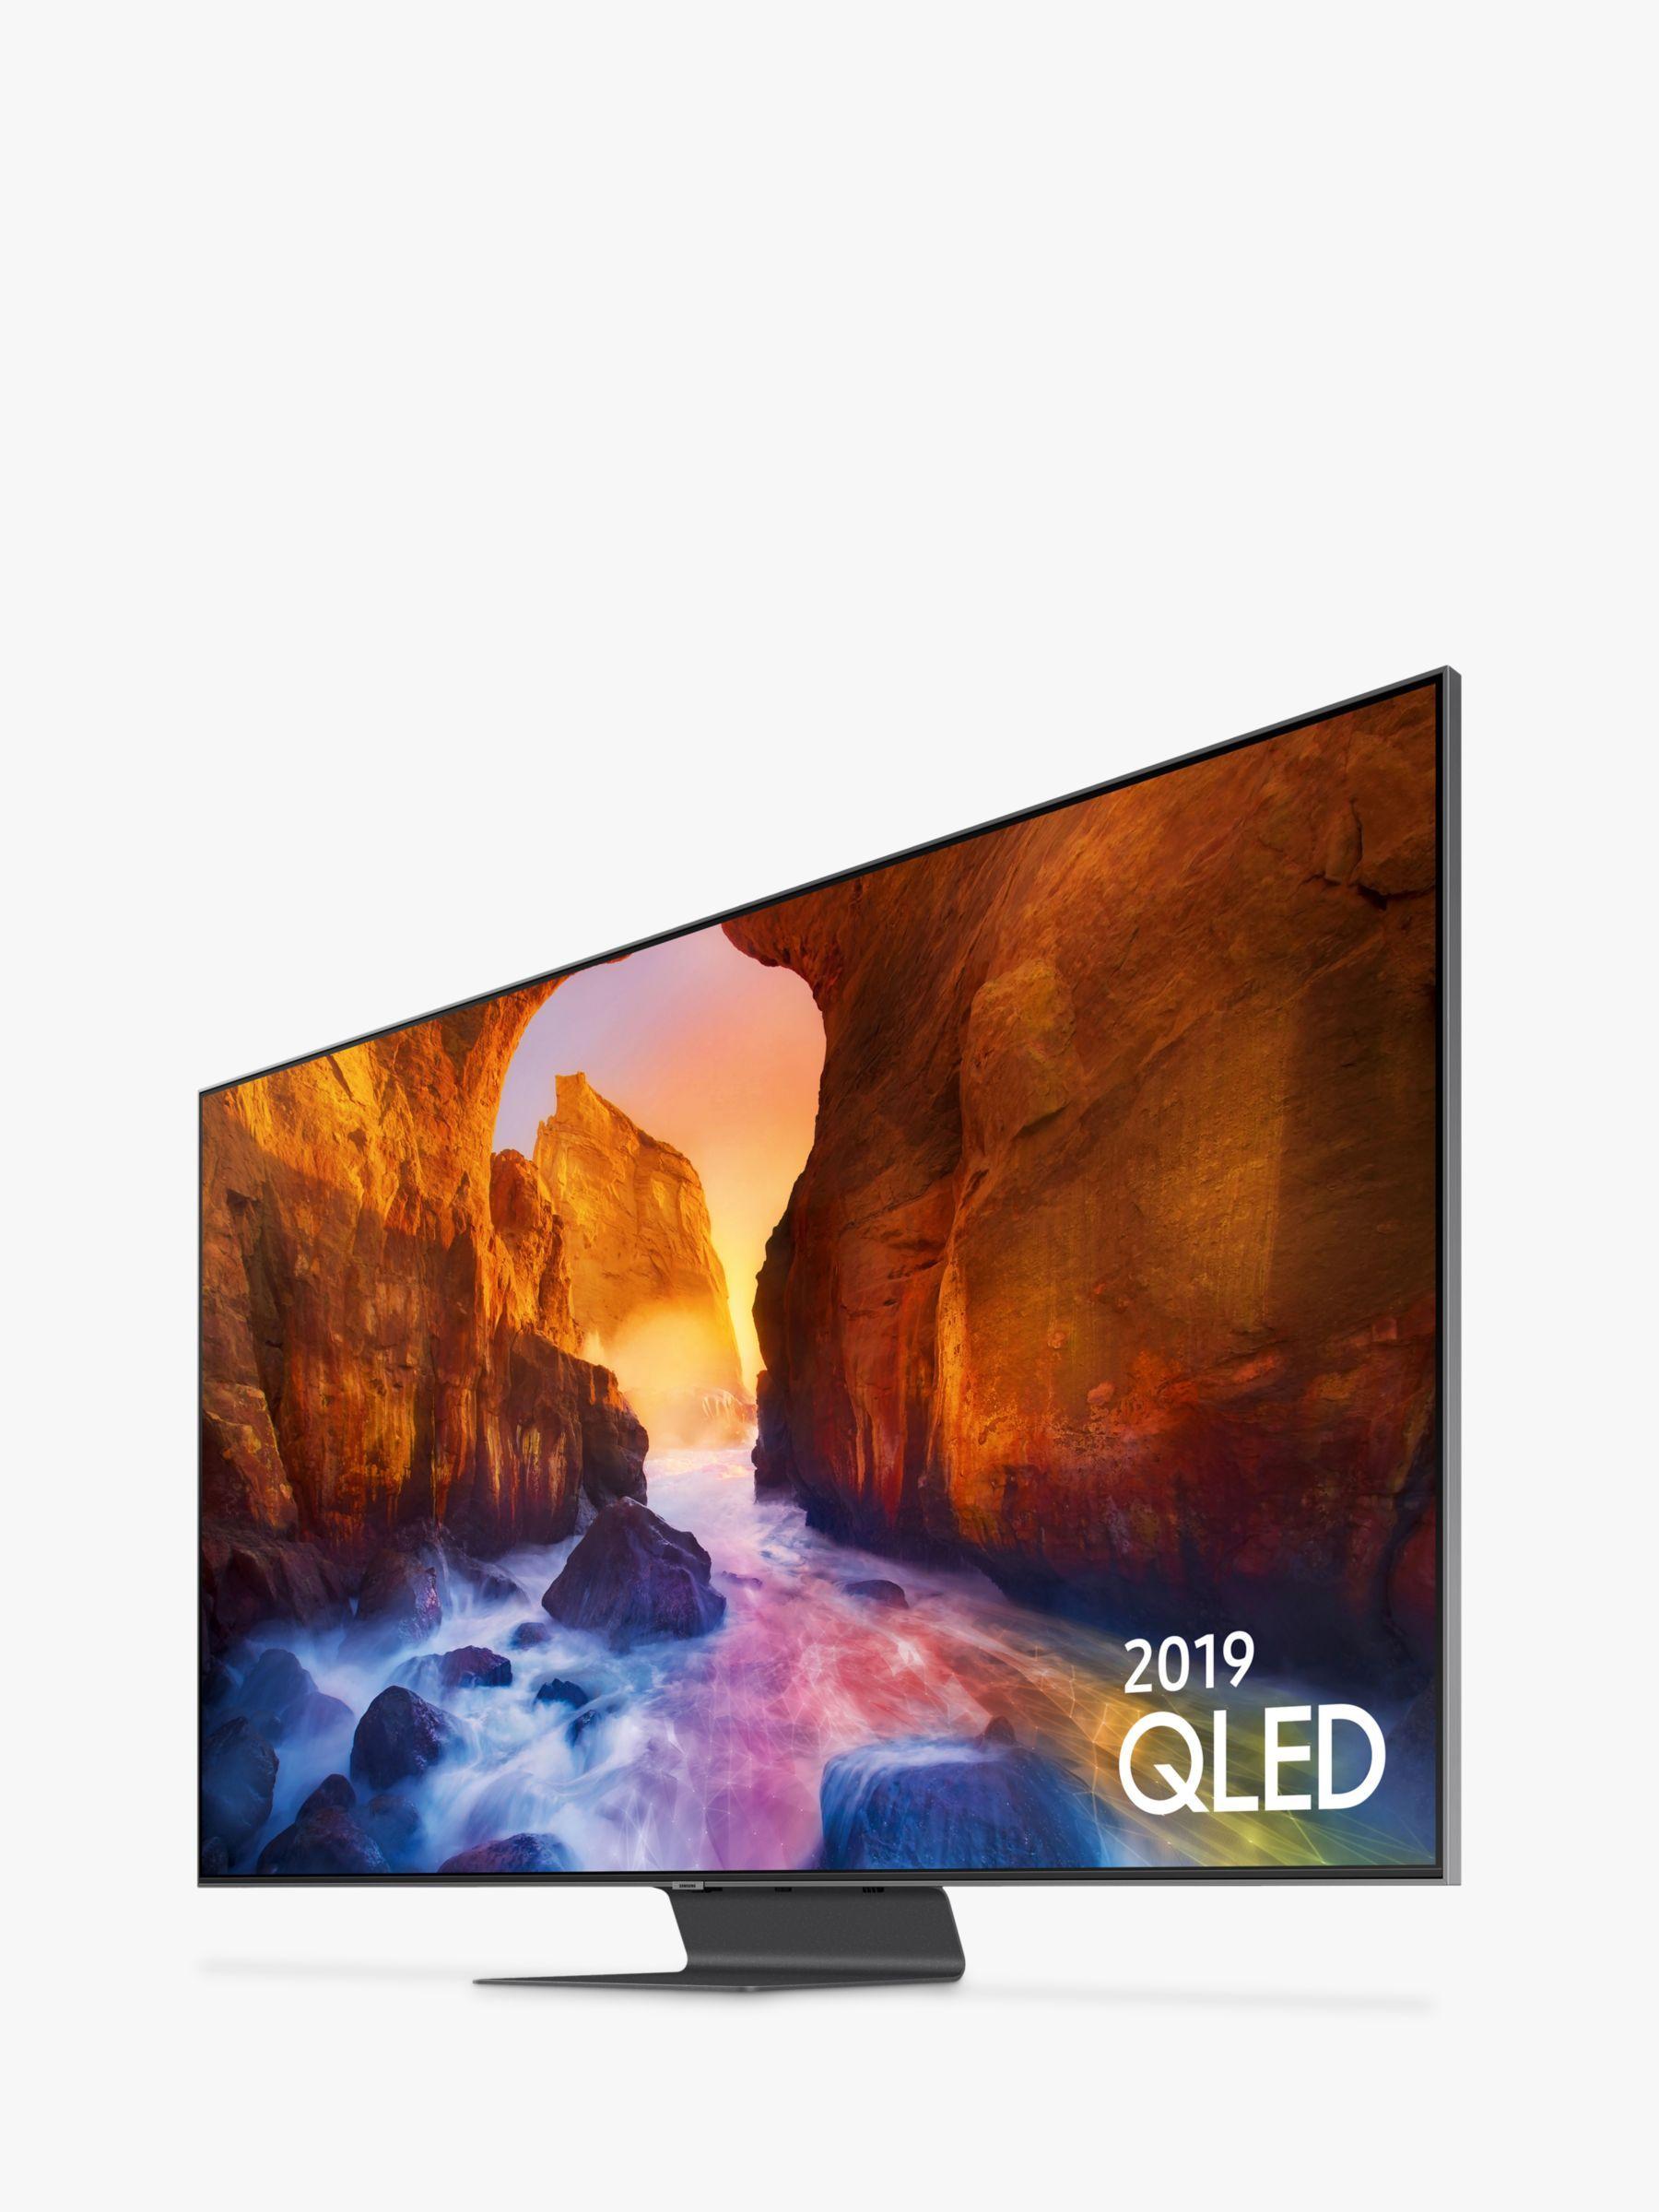 Samsung Qe75q90r 2019 Qled Hdr 2000 4k Ultra Hd Smart Tv 75